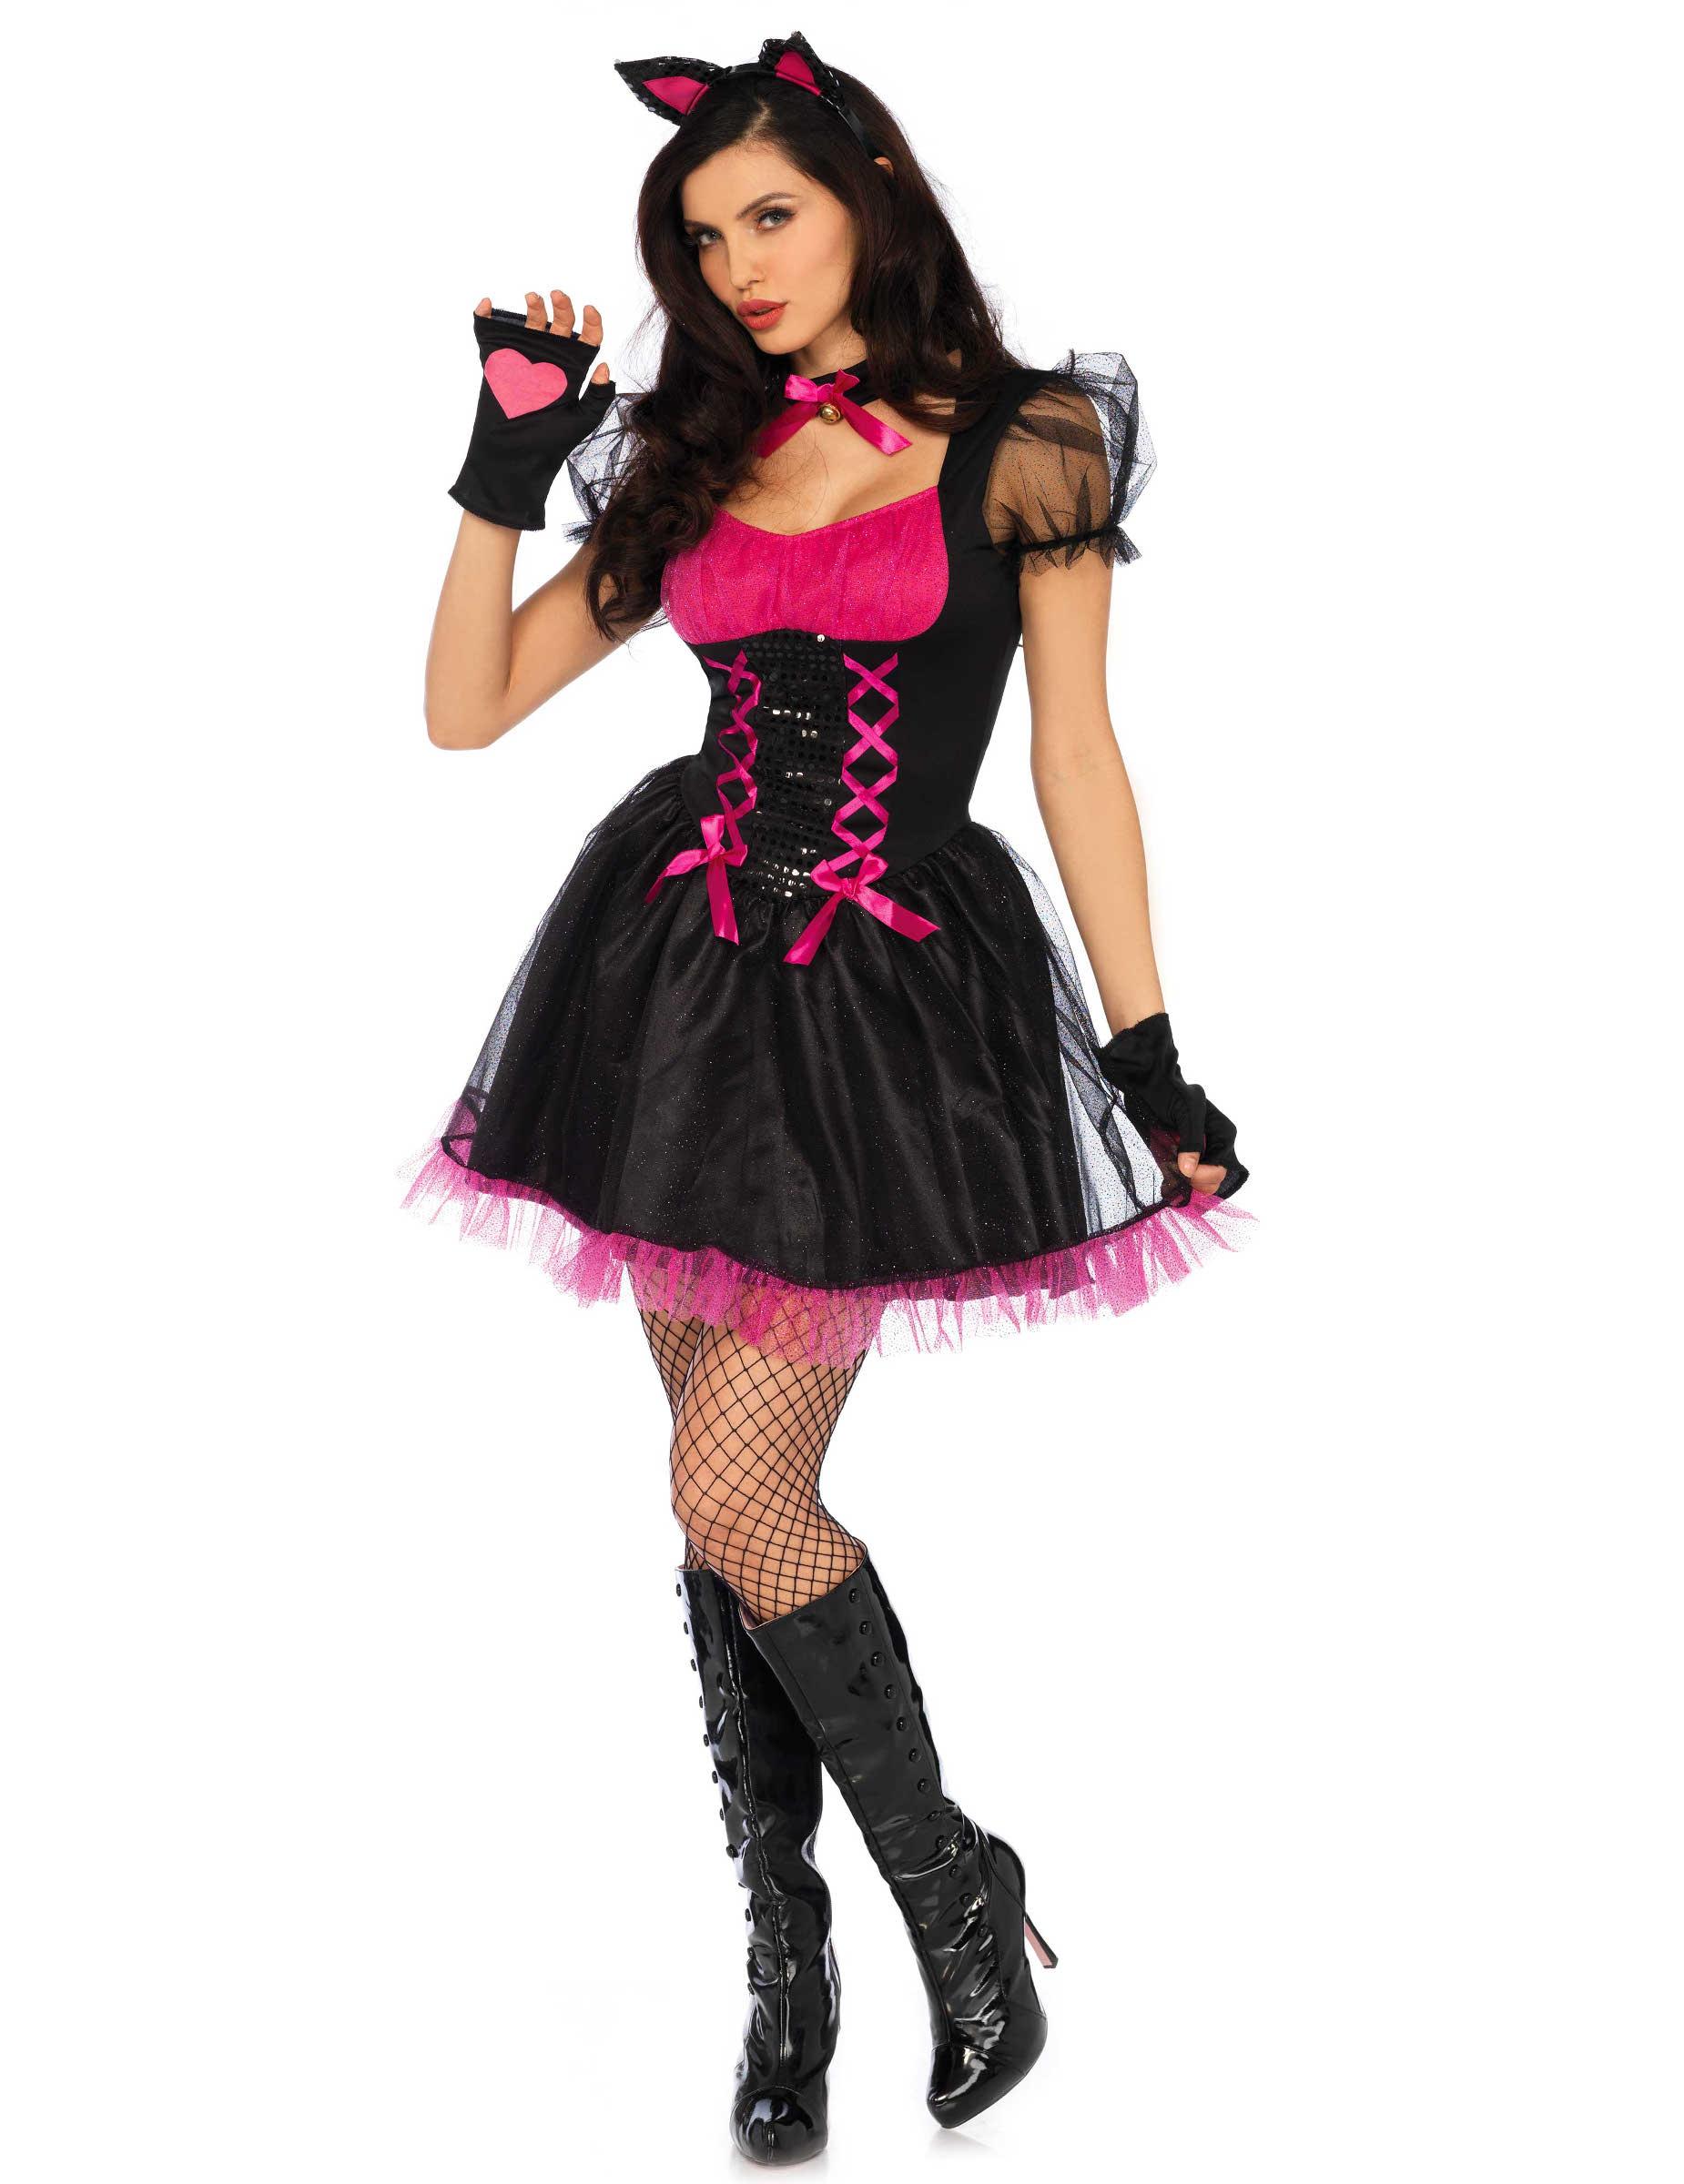 sexy katzen kost m f r damen schwarz rosa g nstige faschings kost me bei karneval megastore. Black Bedroom Furniture Sets. Home Design Ideas